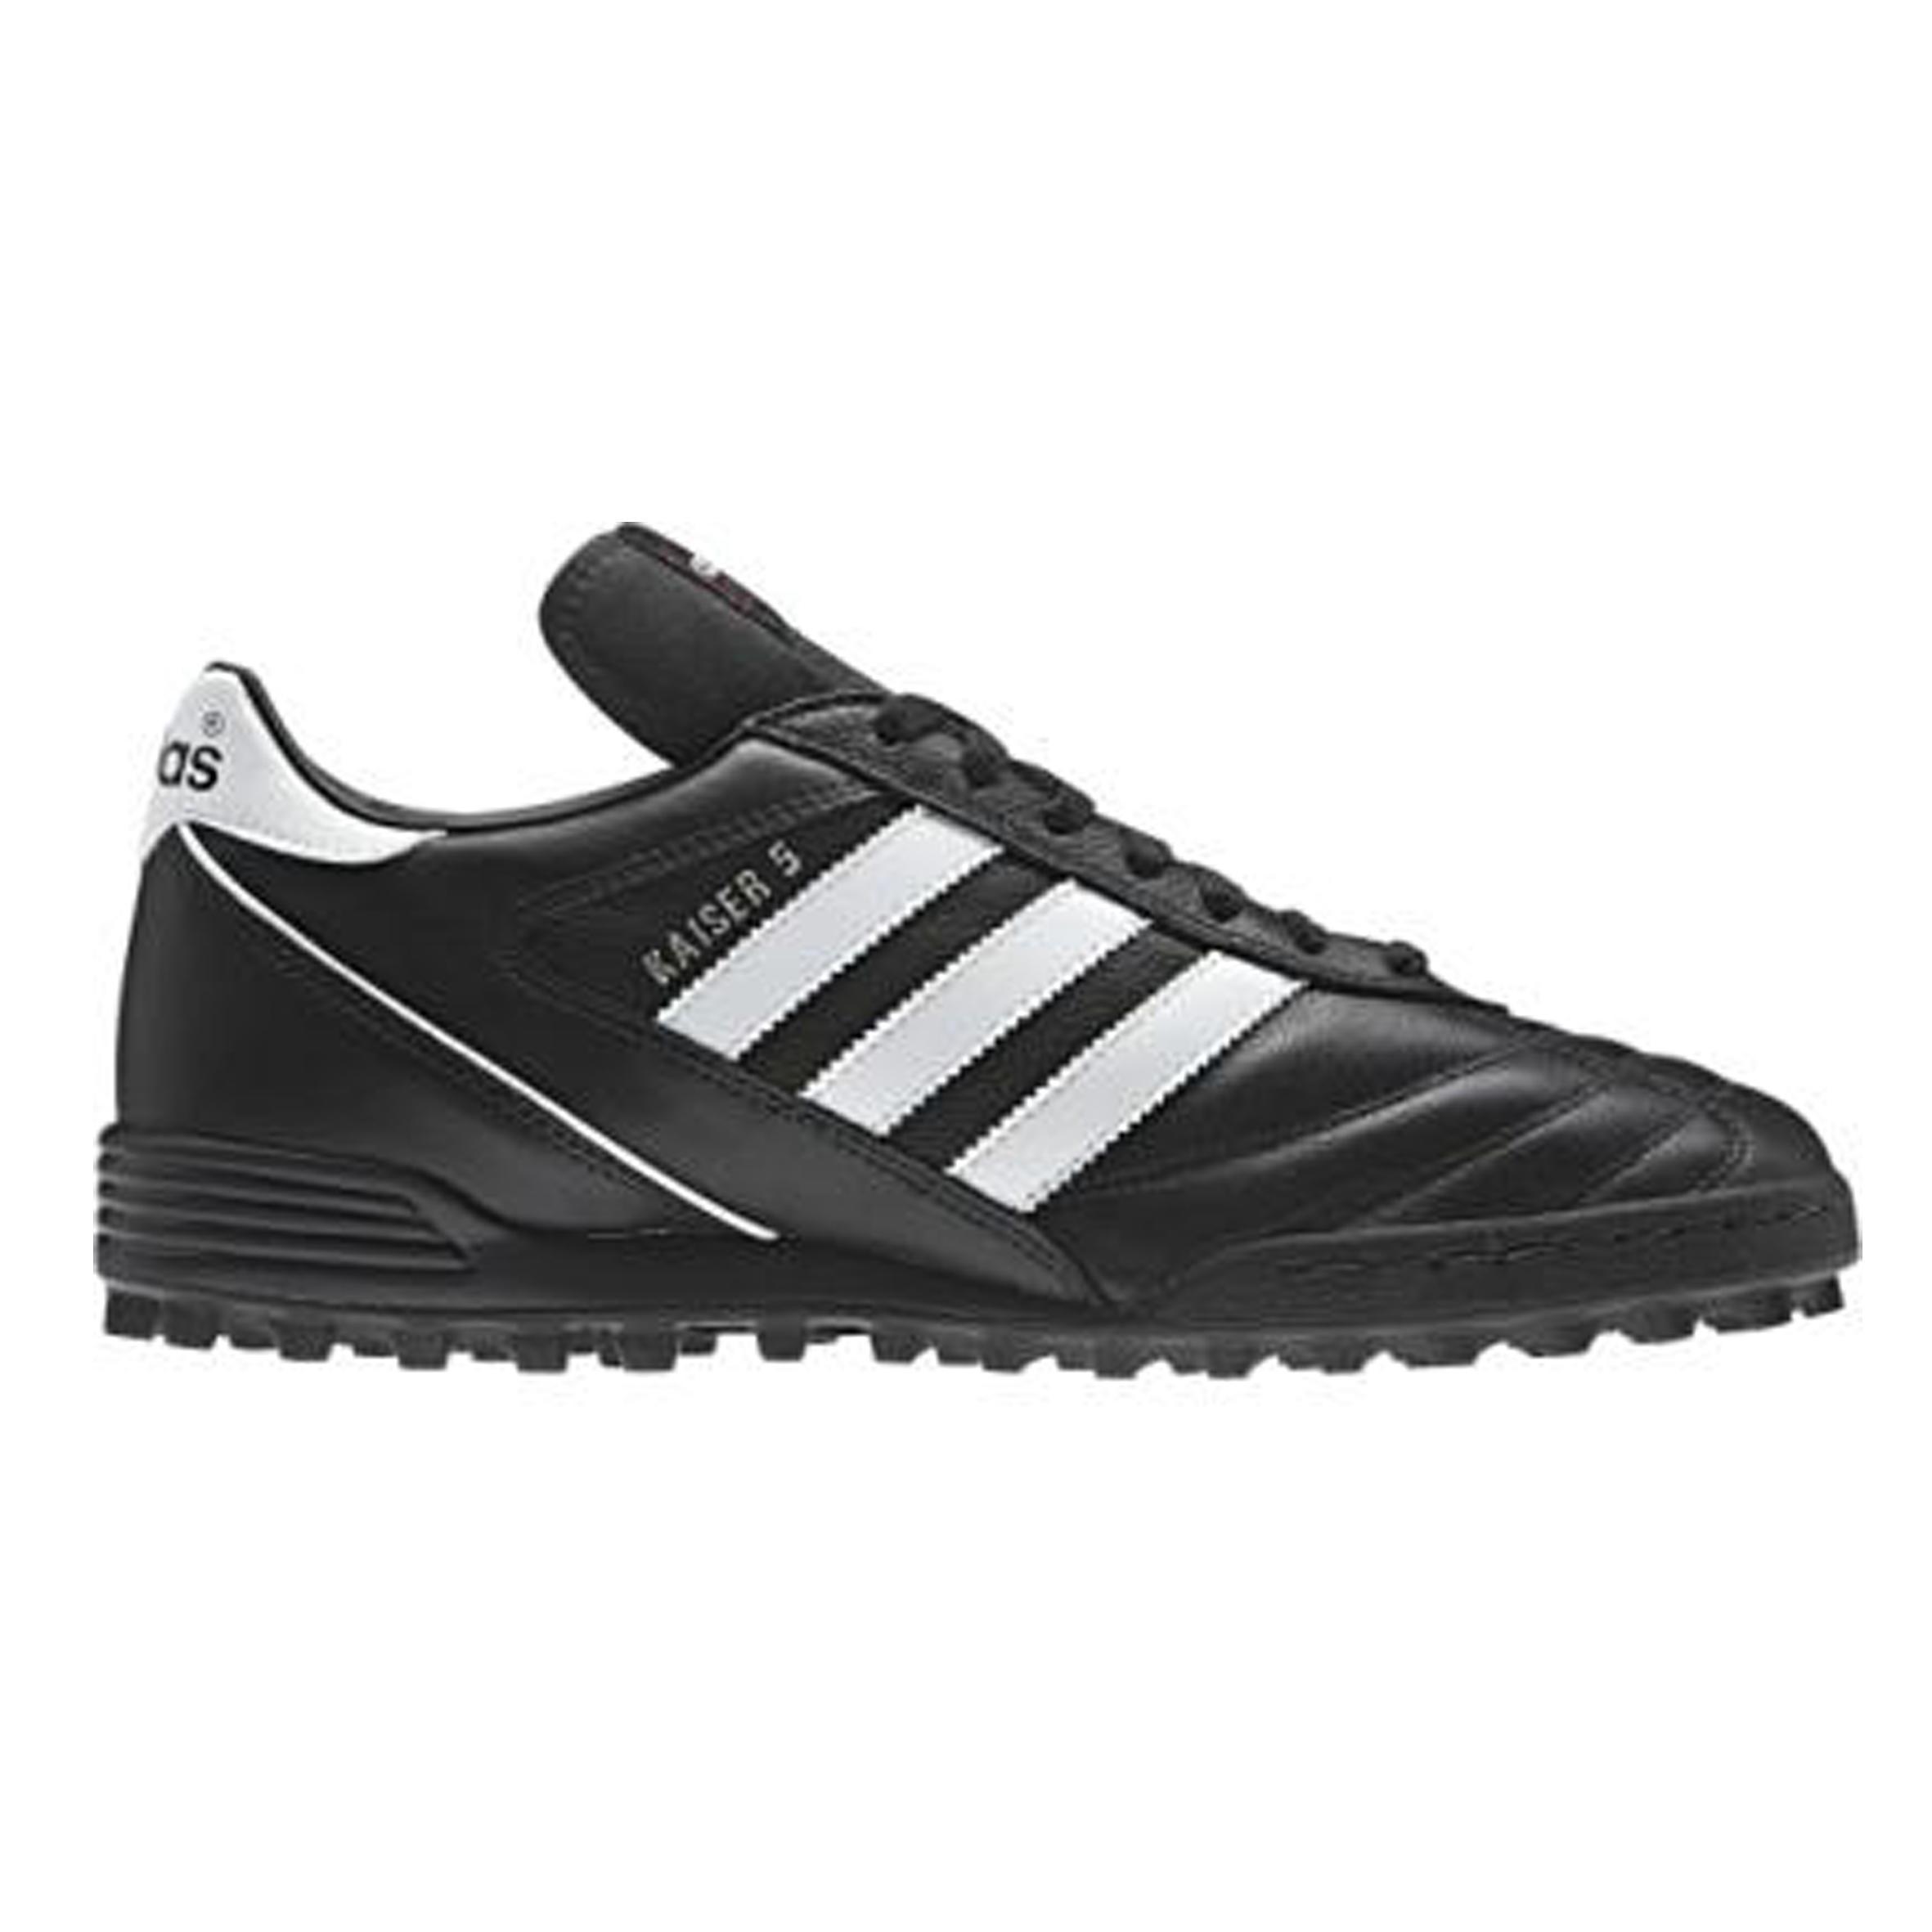 chaussure de foot adidas nouvel